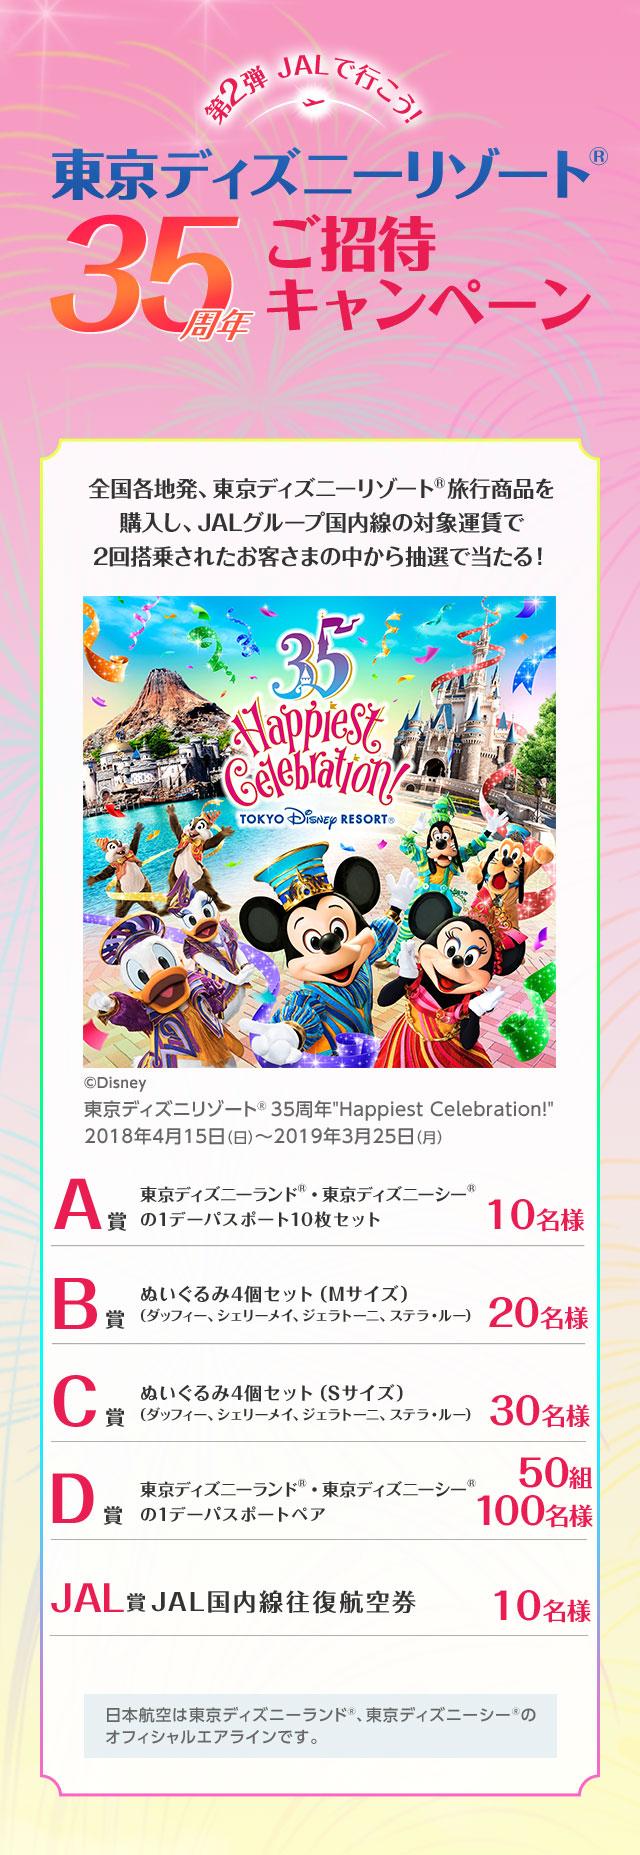 jal楽パック jal 東京ディズニーリゾート®35周年ご招待キャンペーン第2弾